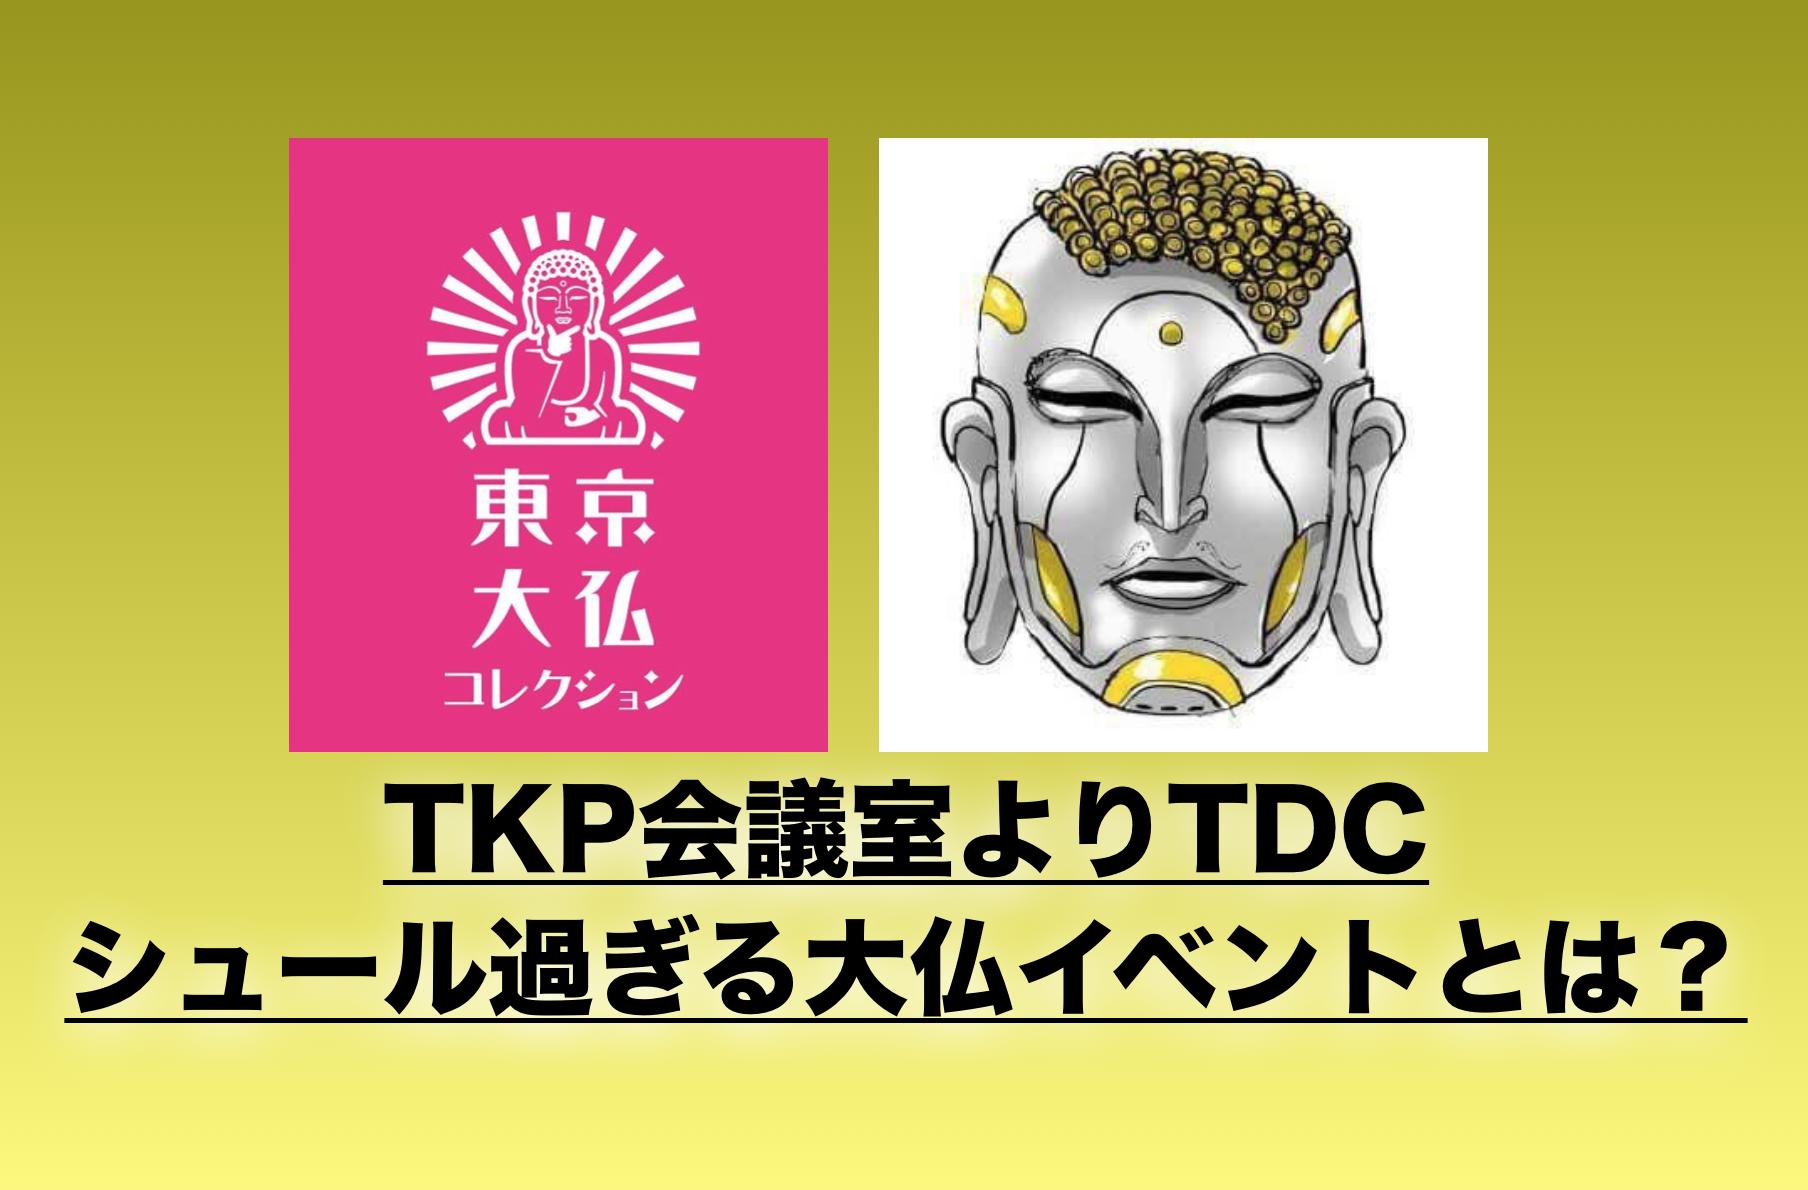 TKP会議室よりTDC シュール過ぎる大仏イベントとは?